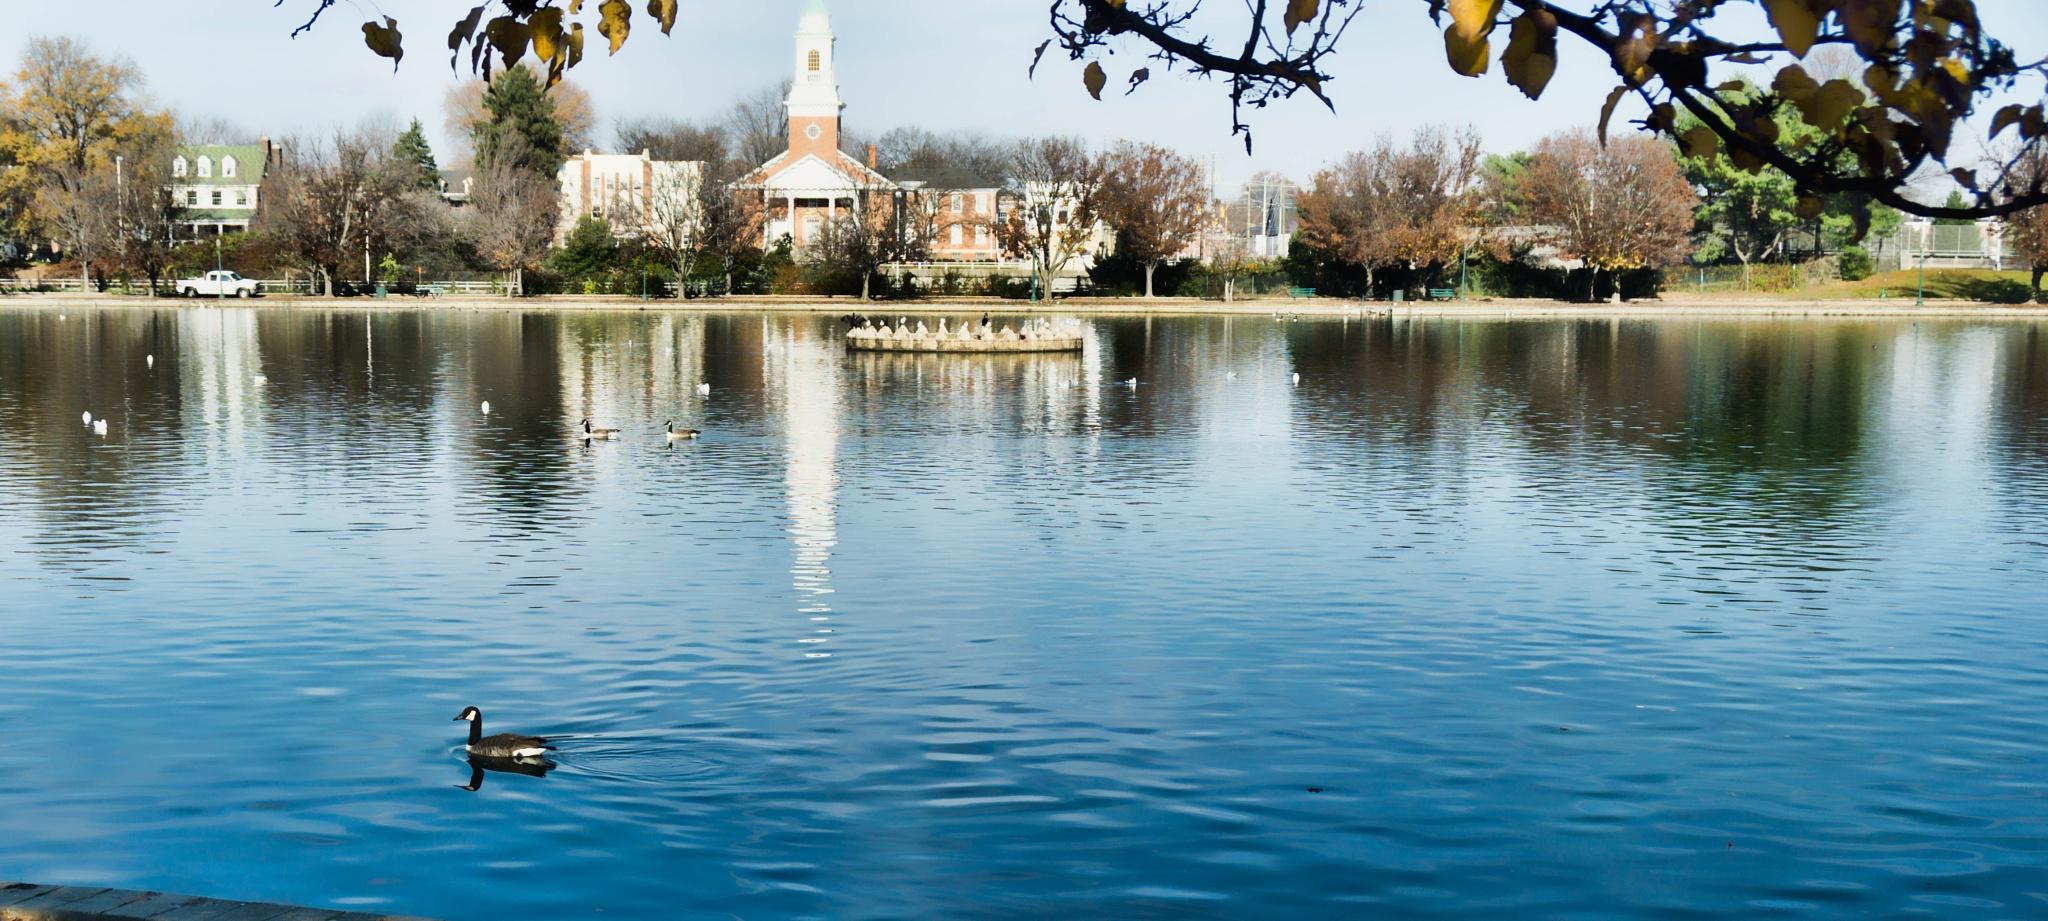 December in Shield's Lake by mjdrhd